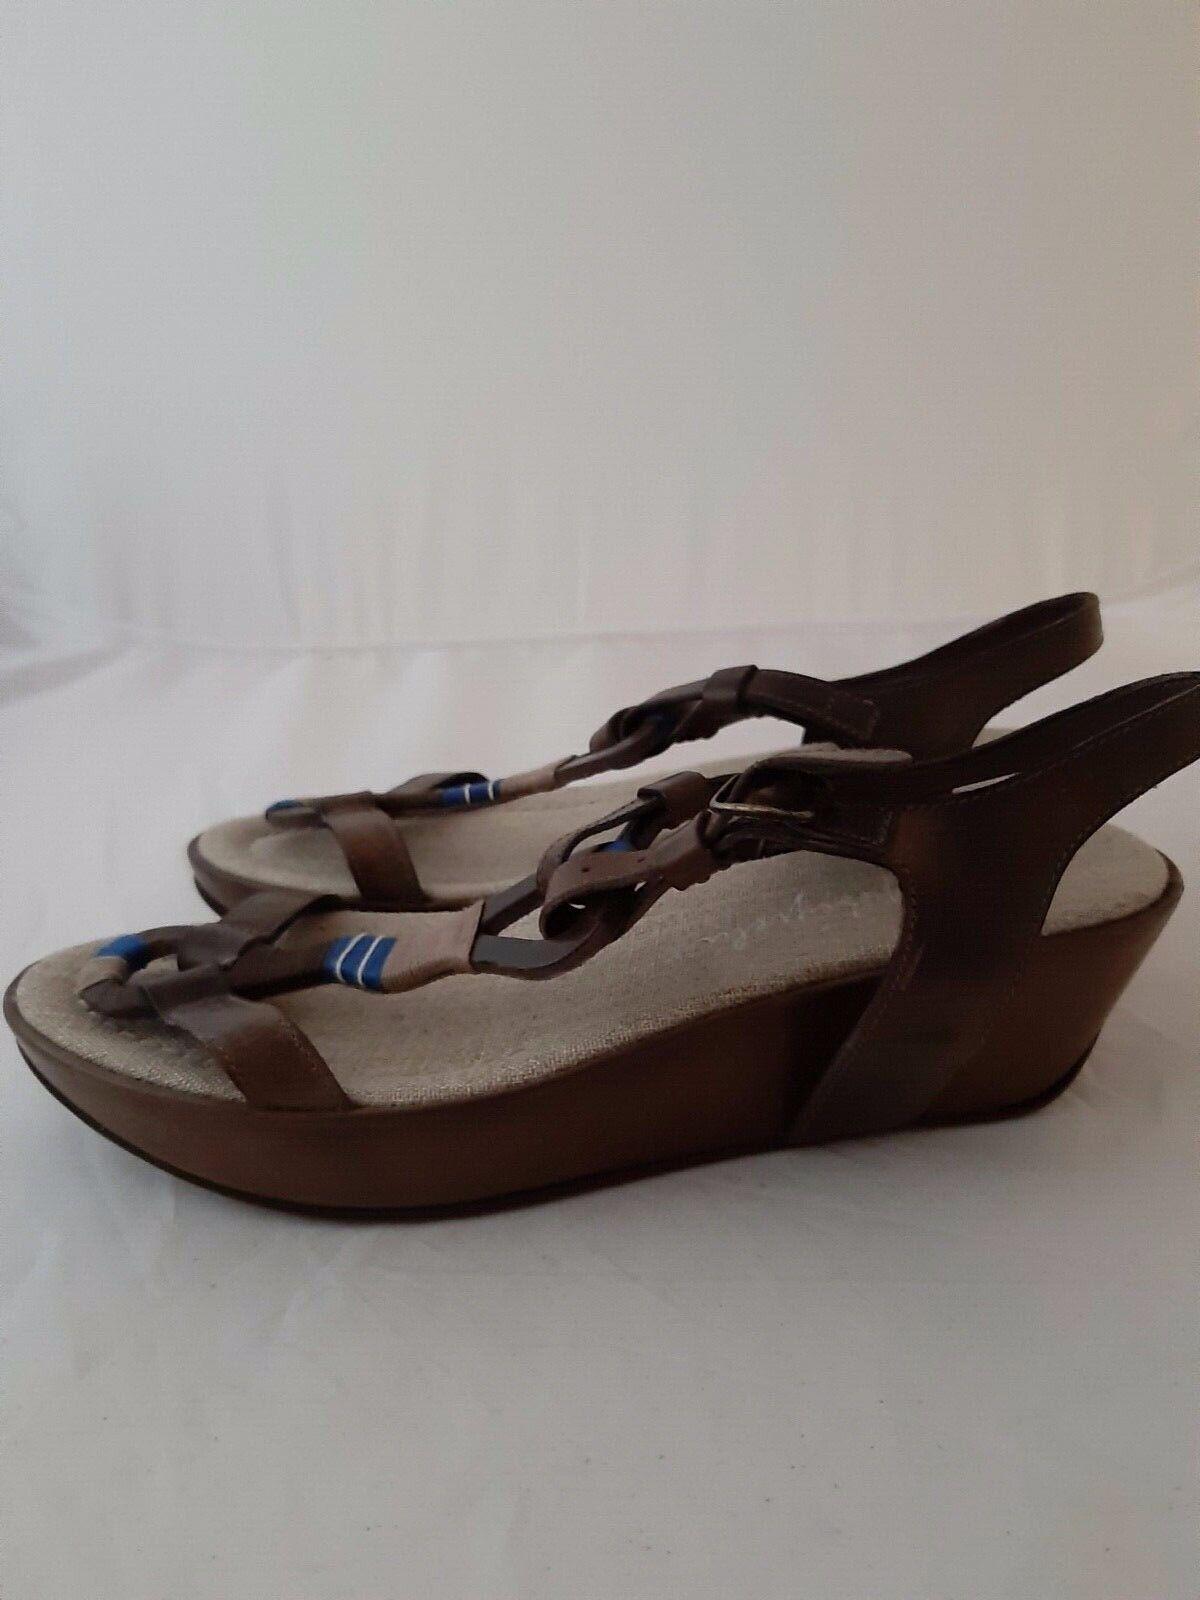 Henry Beguelin Toupe Leather platform sandals size 37